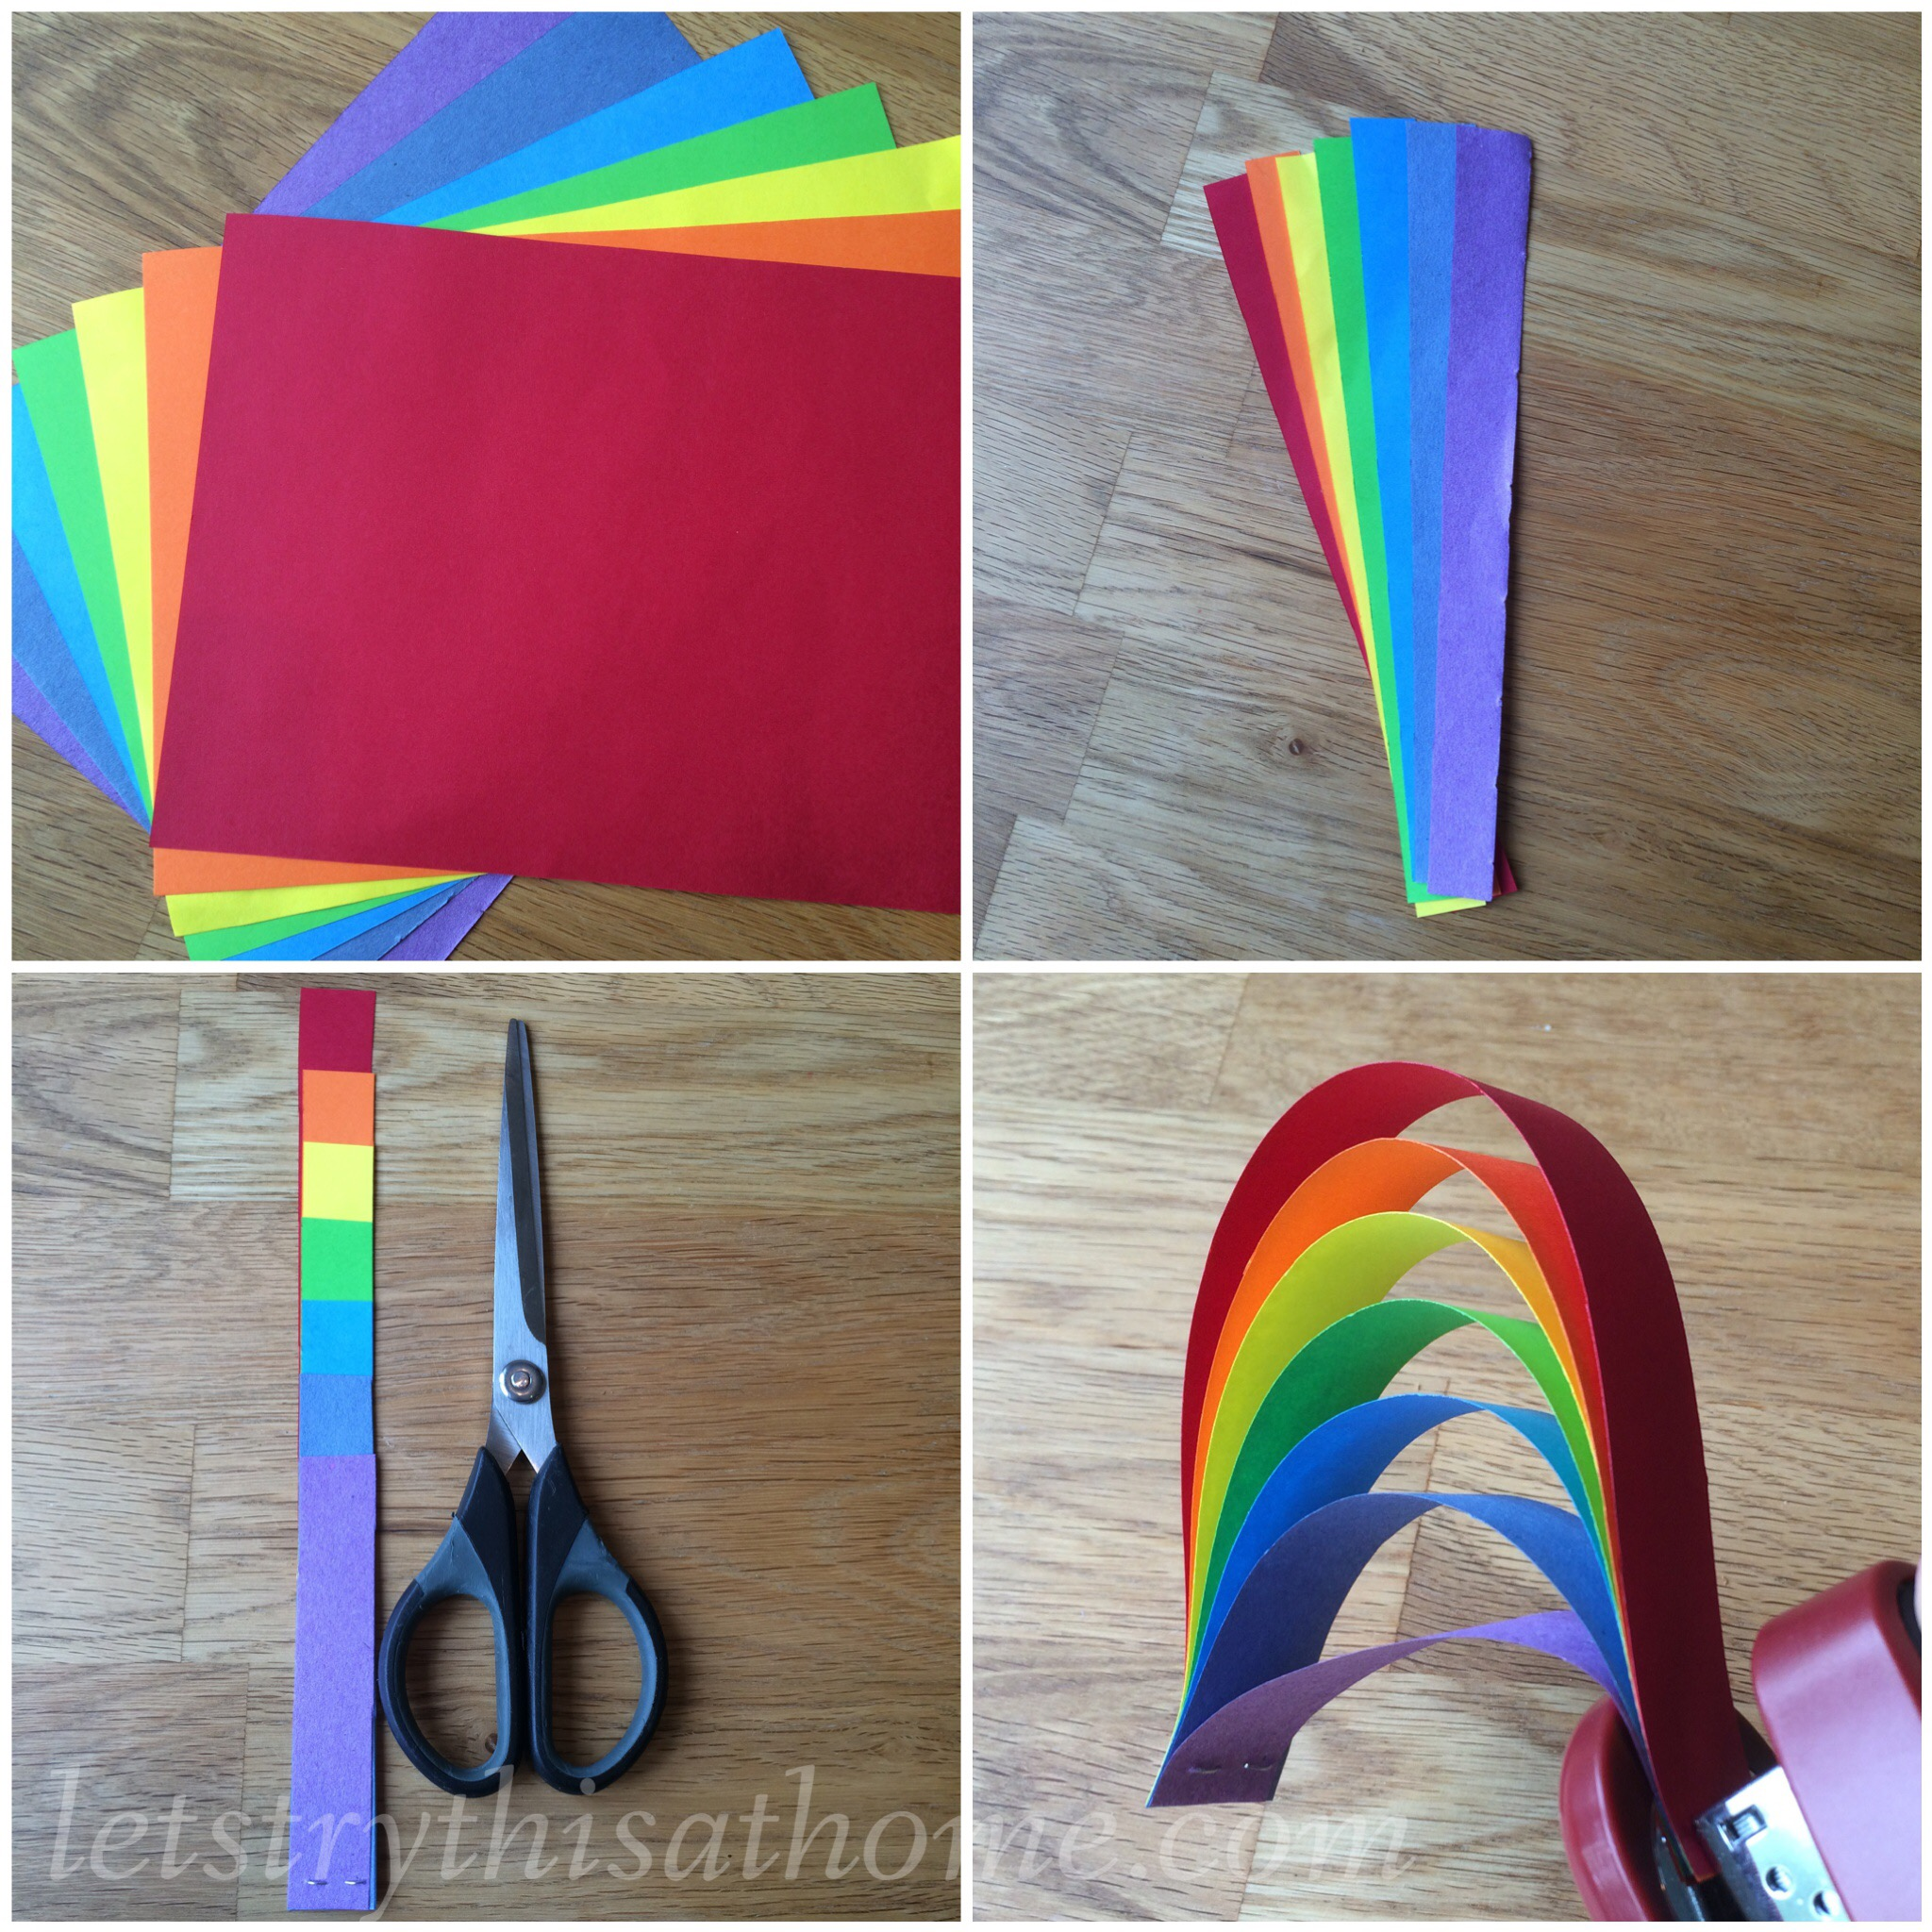 Paper Rainbow Craft Letstrythisathome